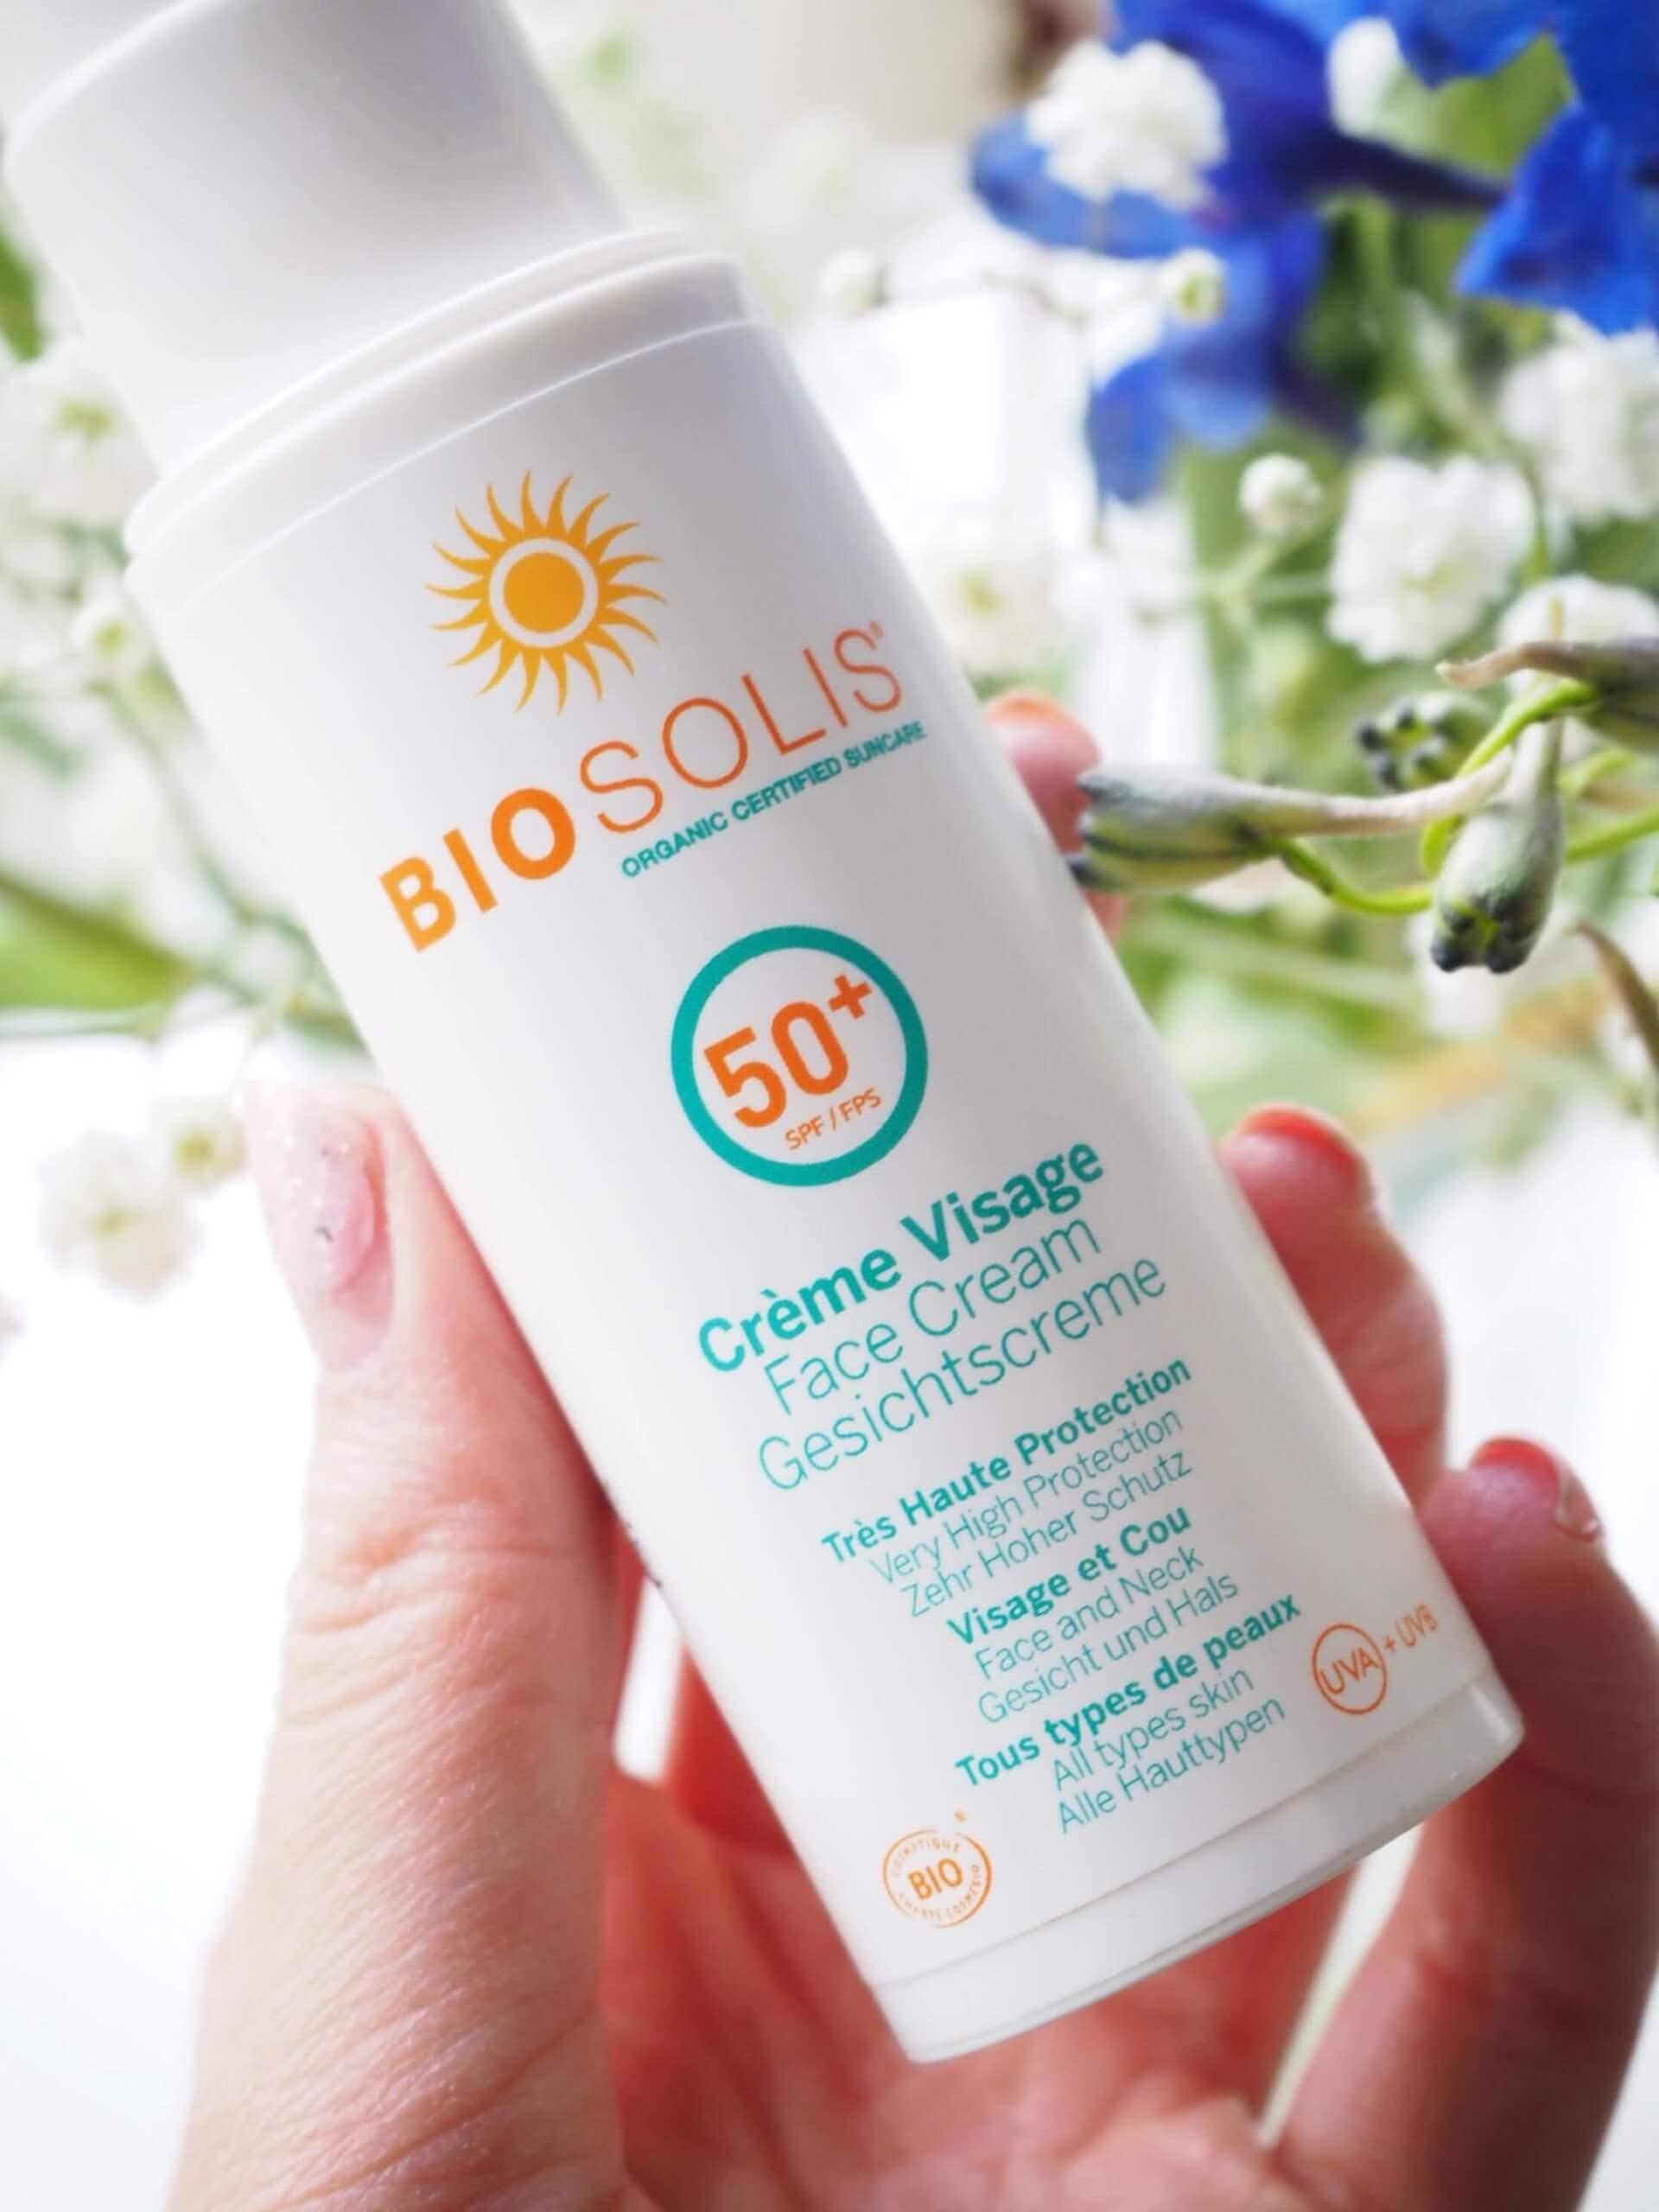 biosolis spf 50